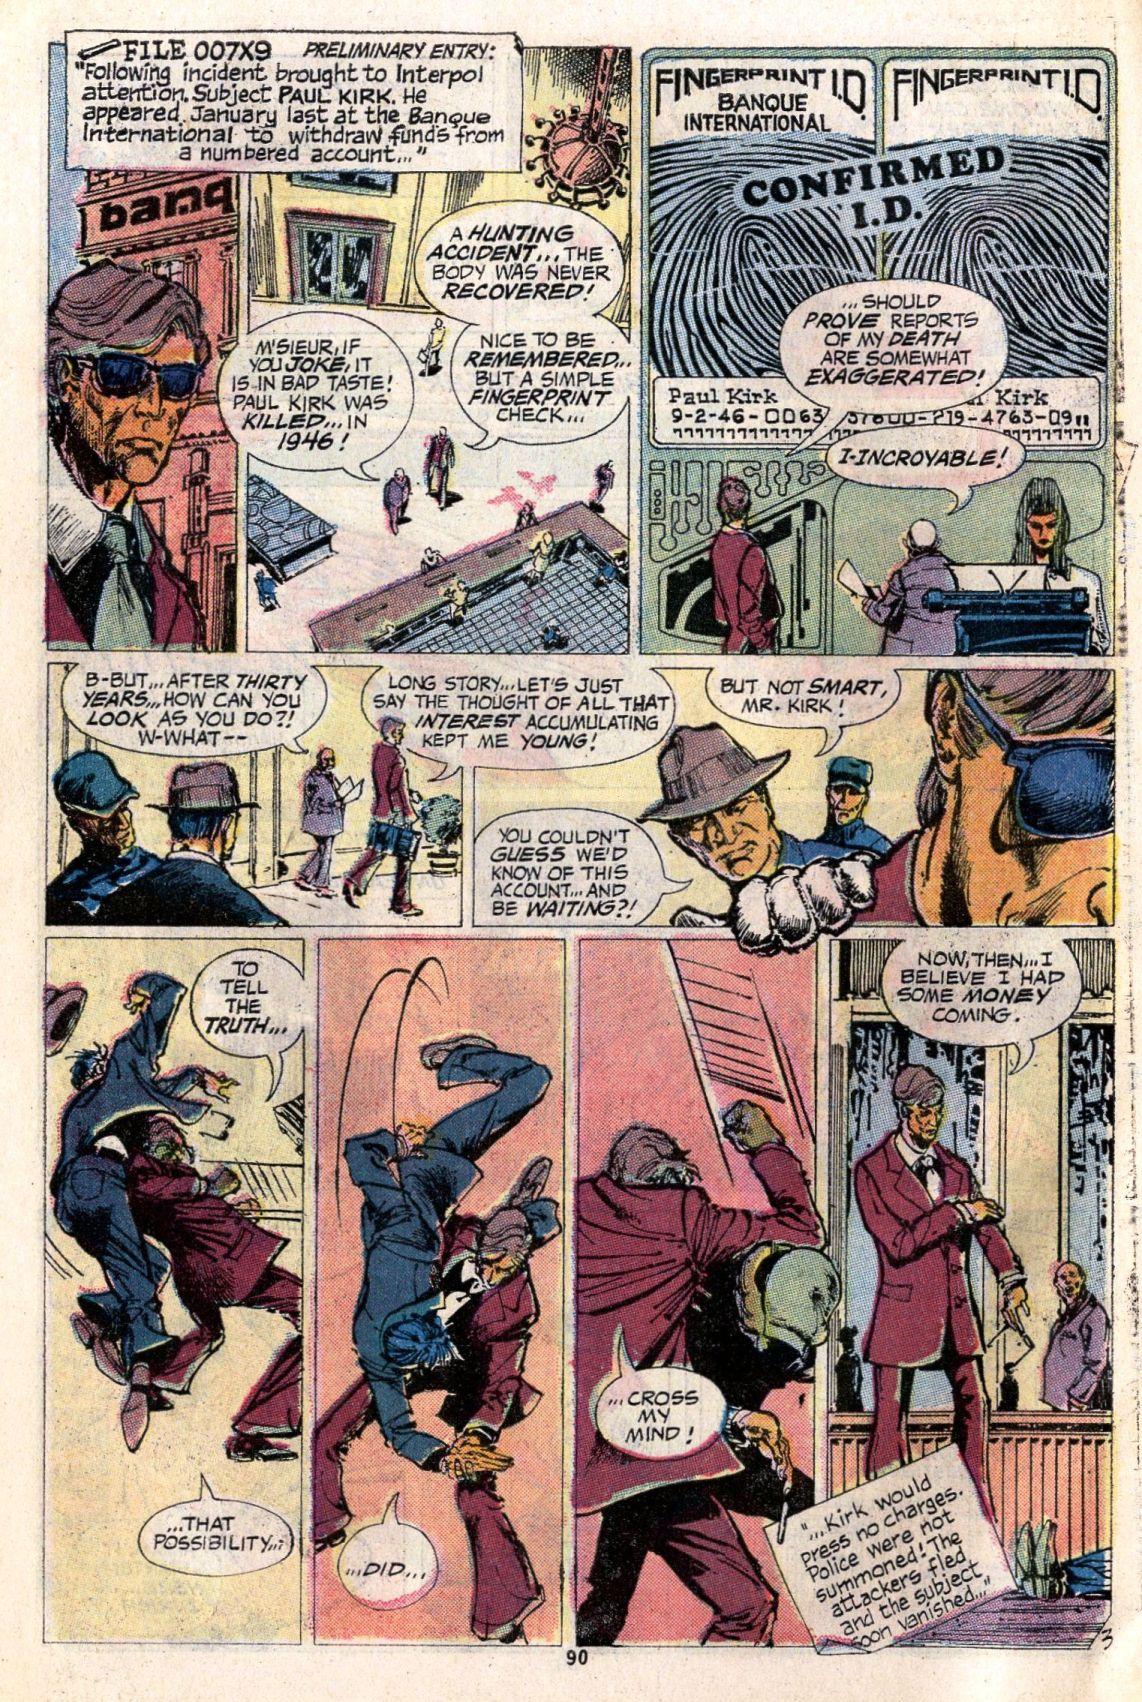 Detective Comics (1937) 438 Page 90